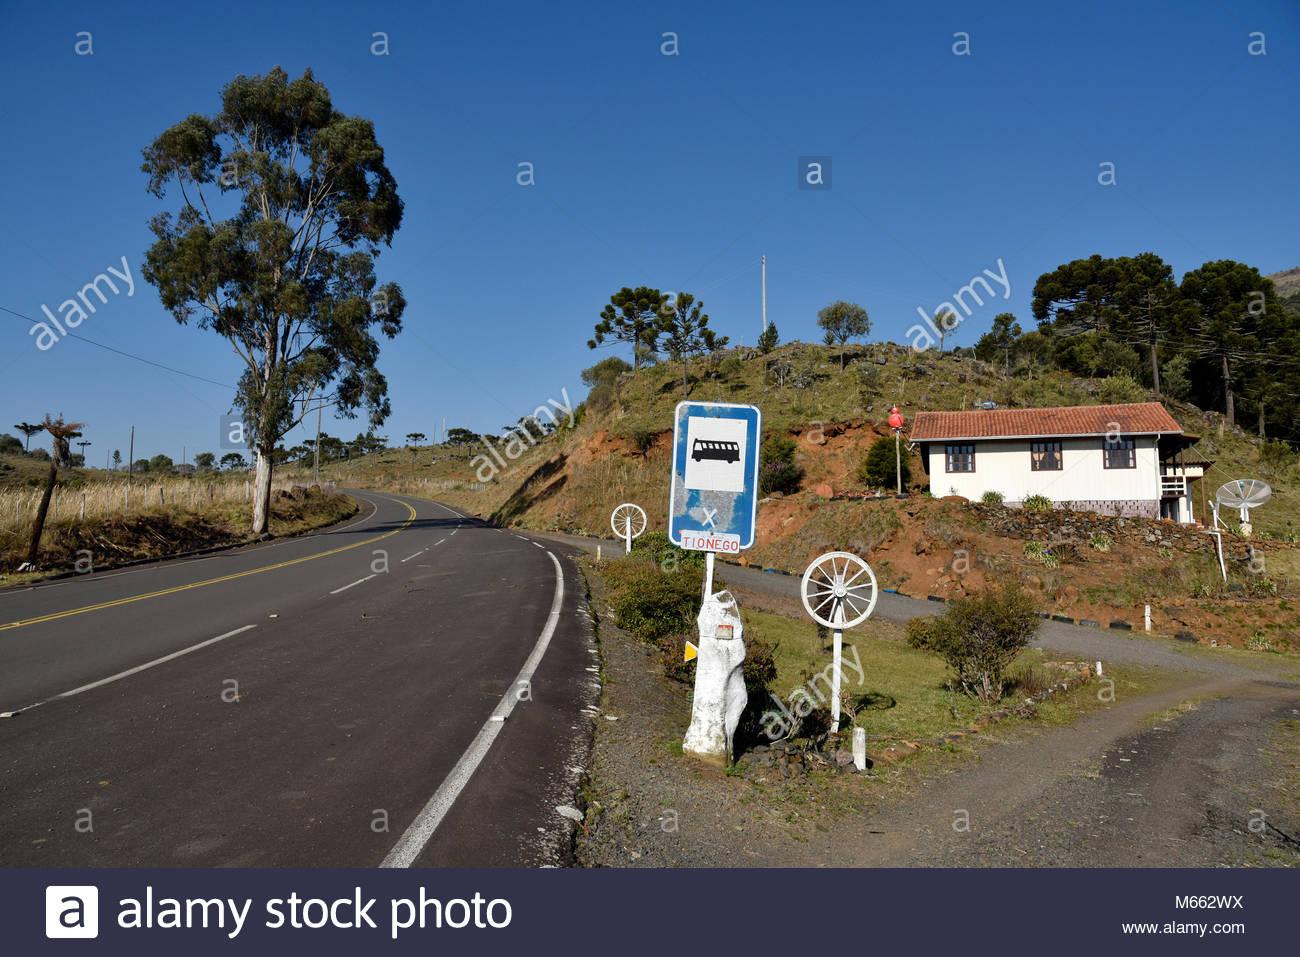 House, margins of Highway SC-110, 2017, Urubici, Santa Catarina, Brazil. Stock Photo